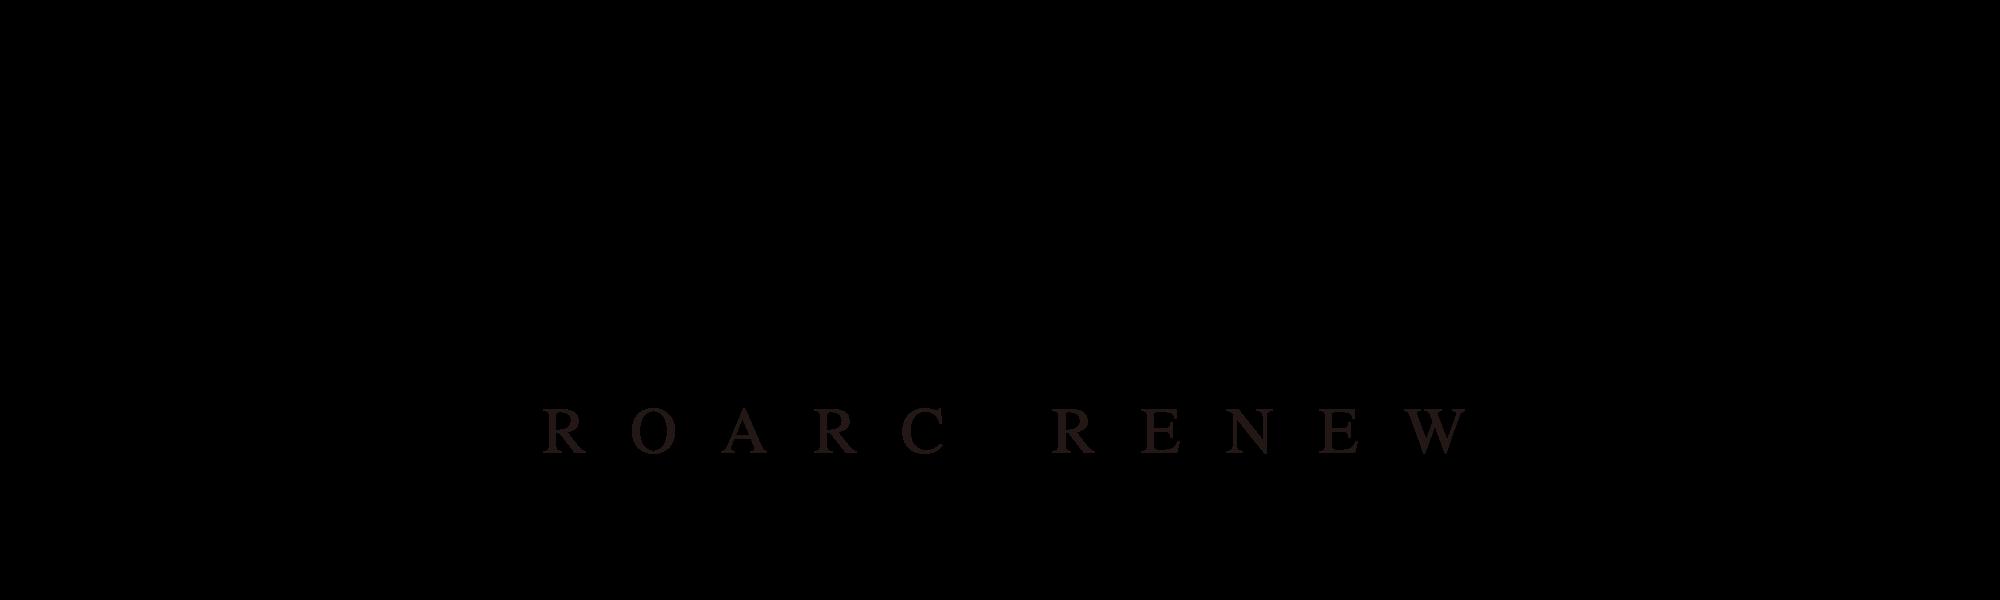 logo1107cs6111